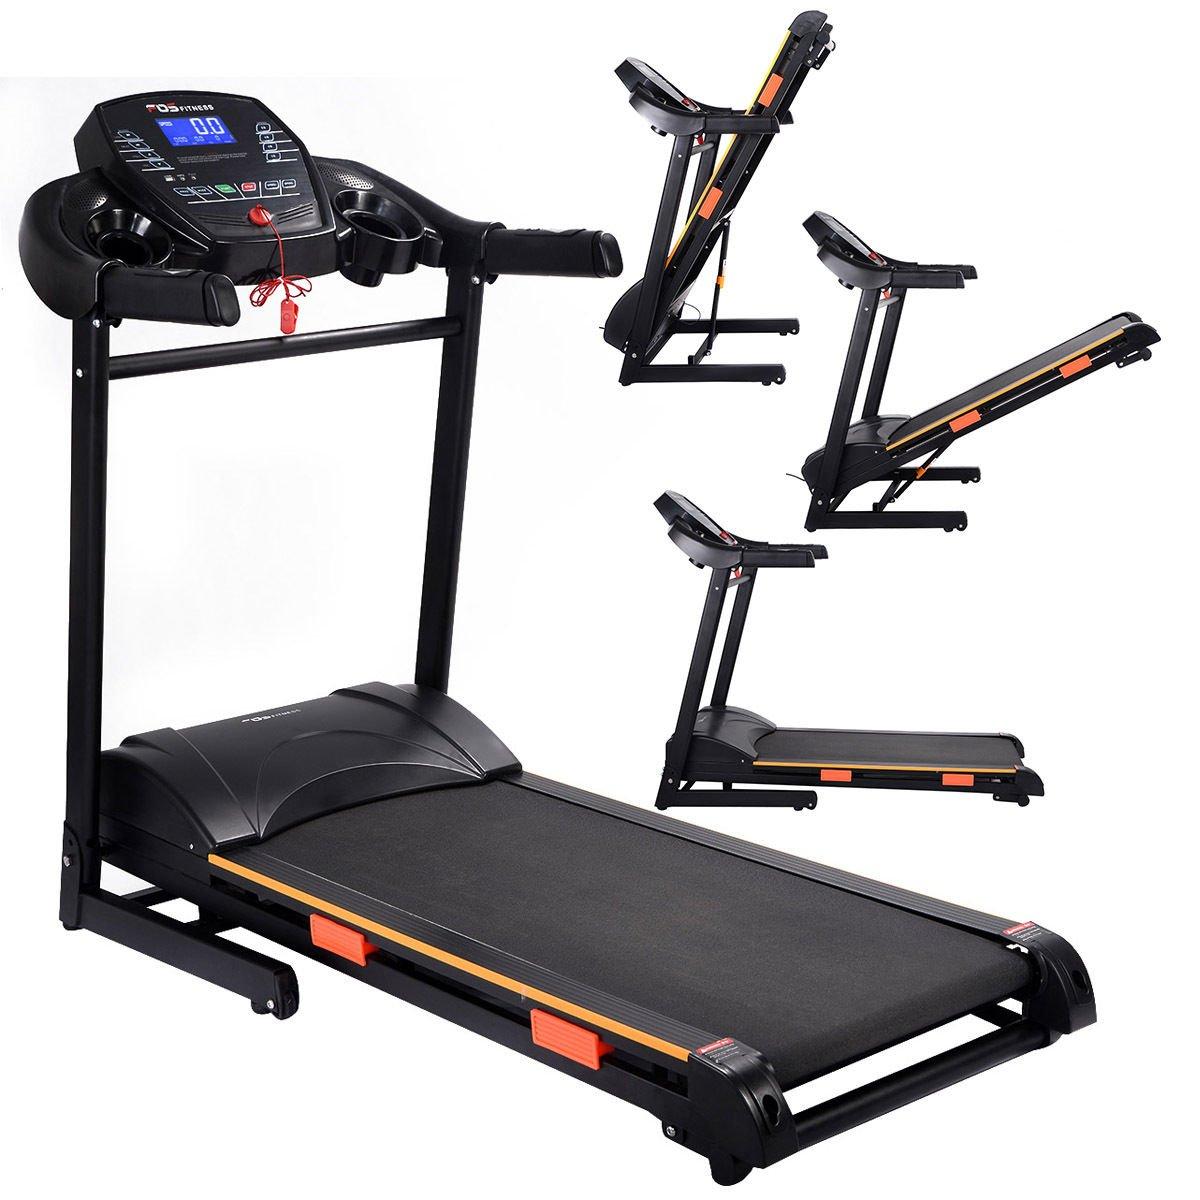 Goplus 1000W Folding Treadmill Electric Motorized Power Running Jogging Machine